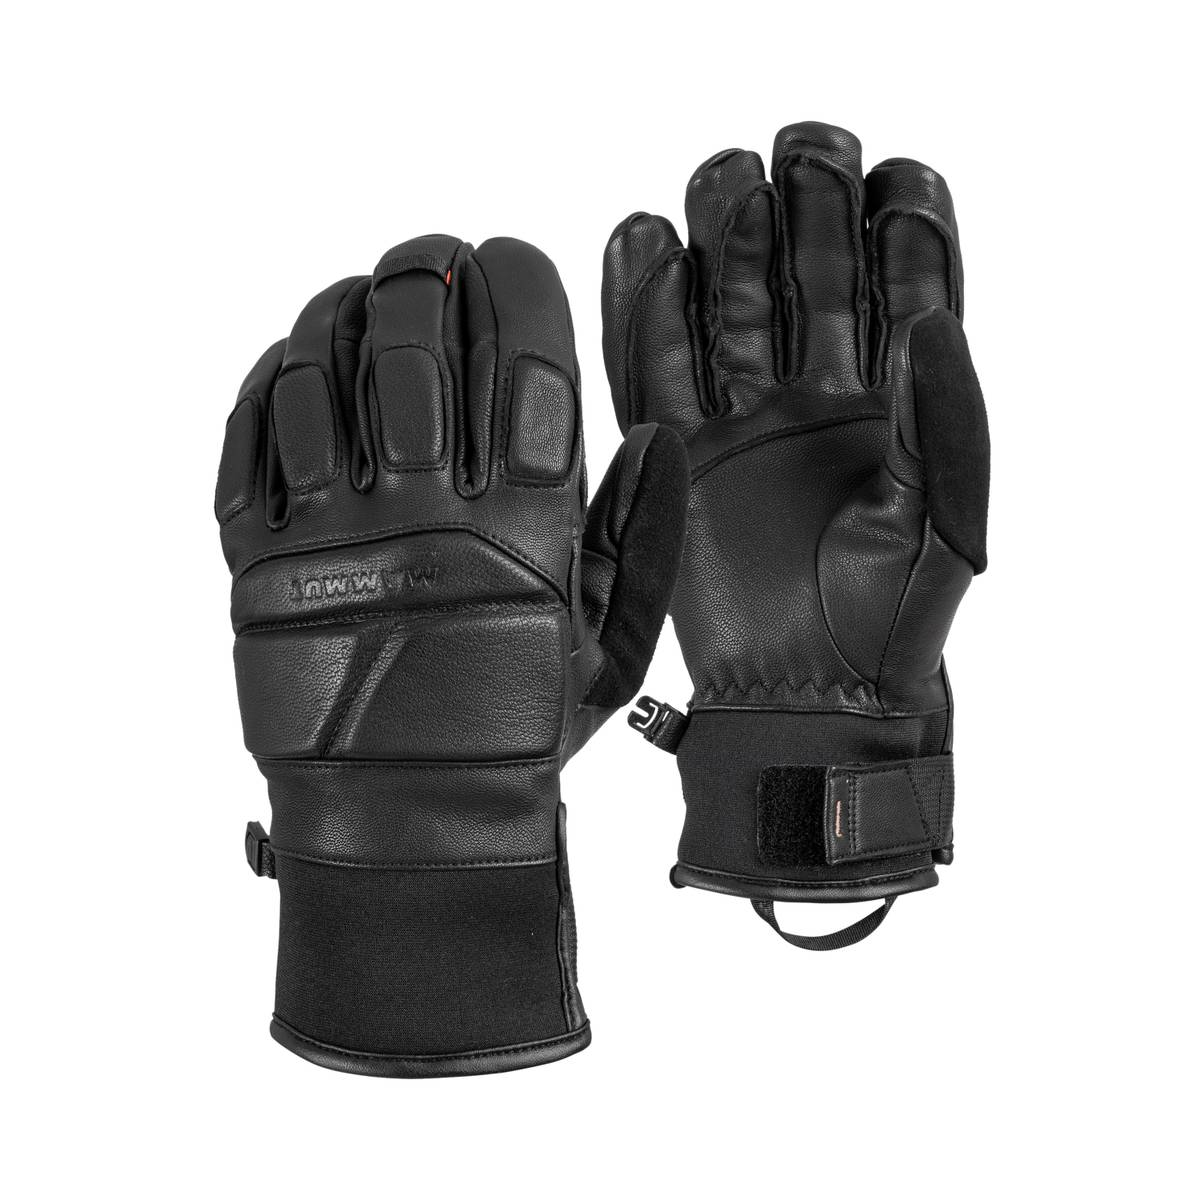 Mammut La Liste Glove Black